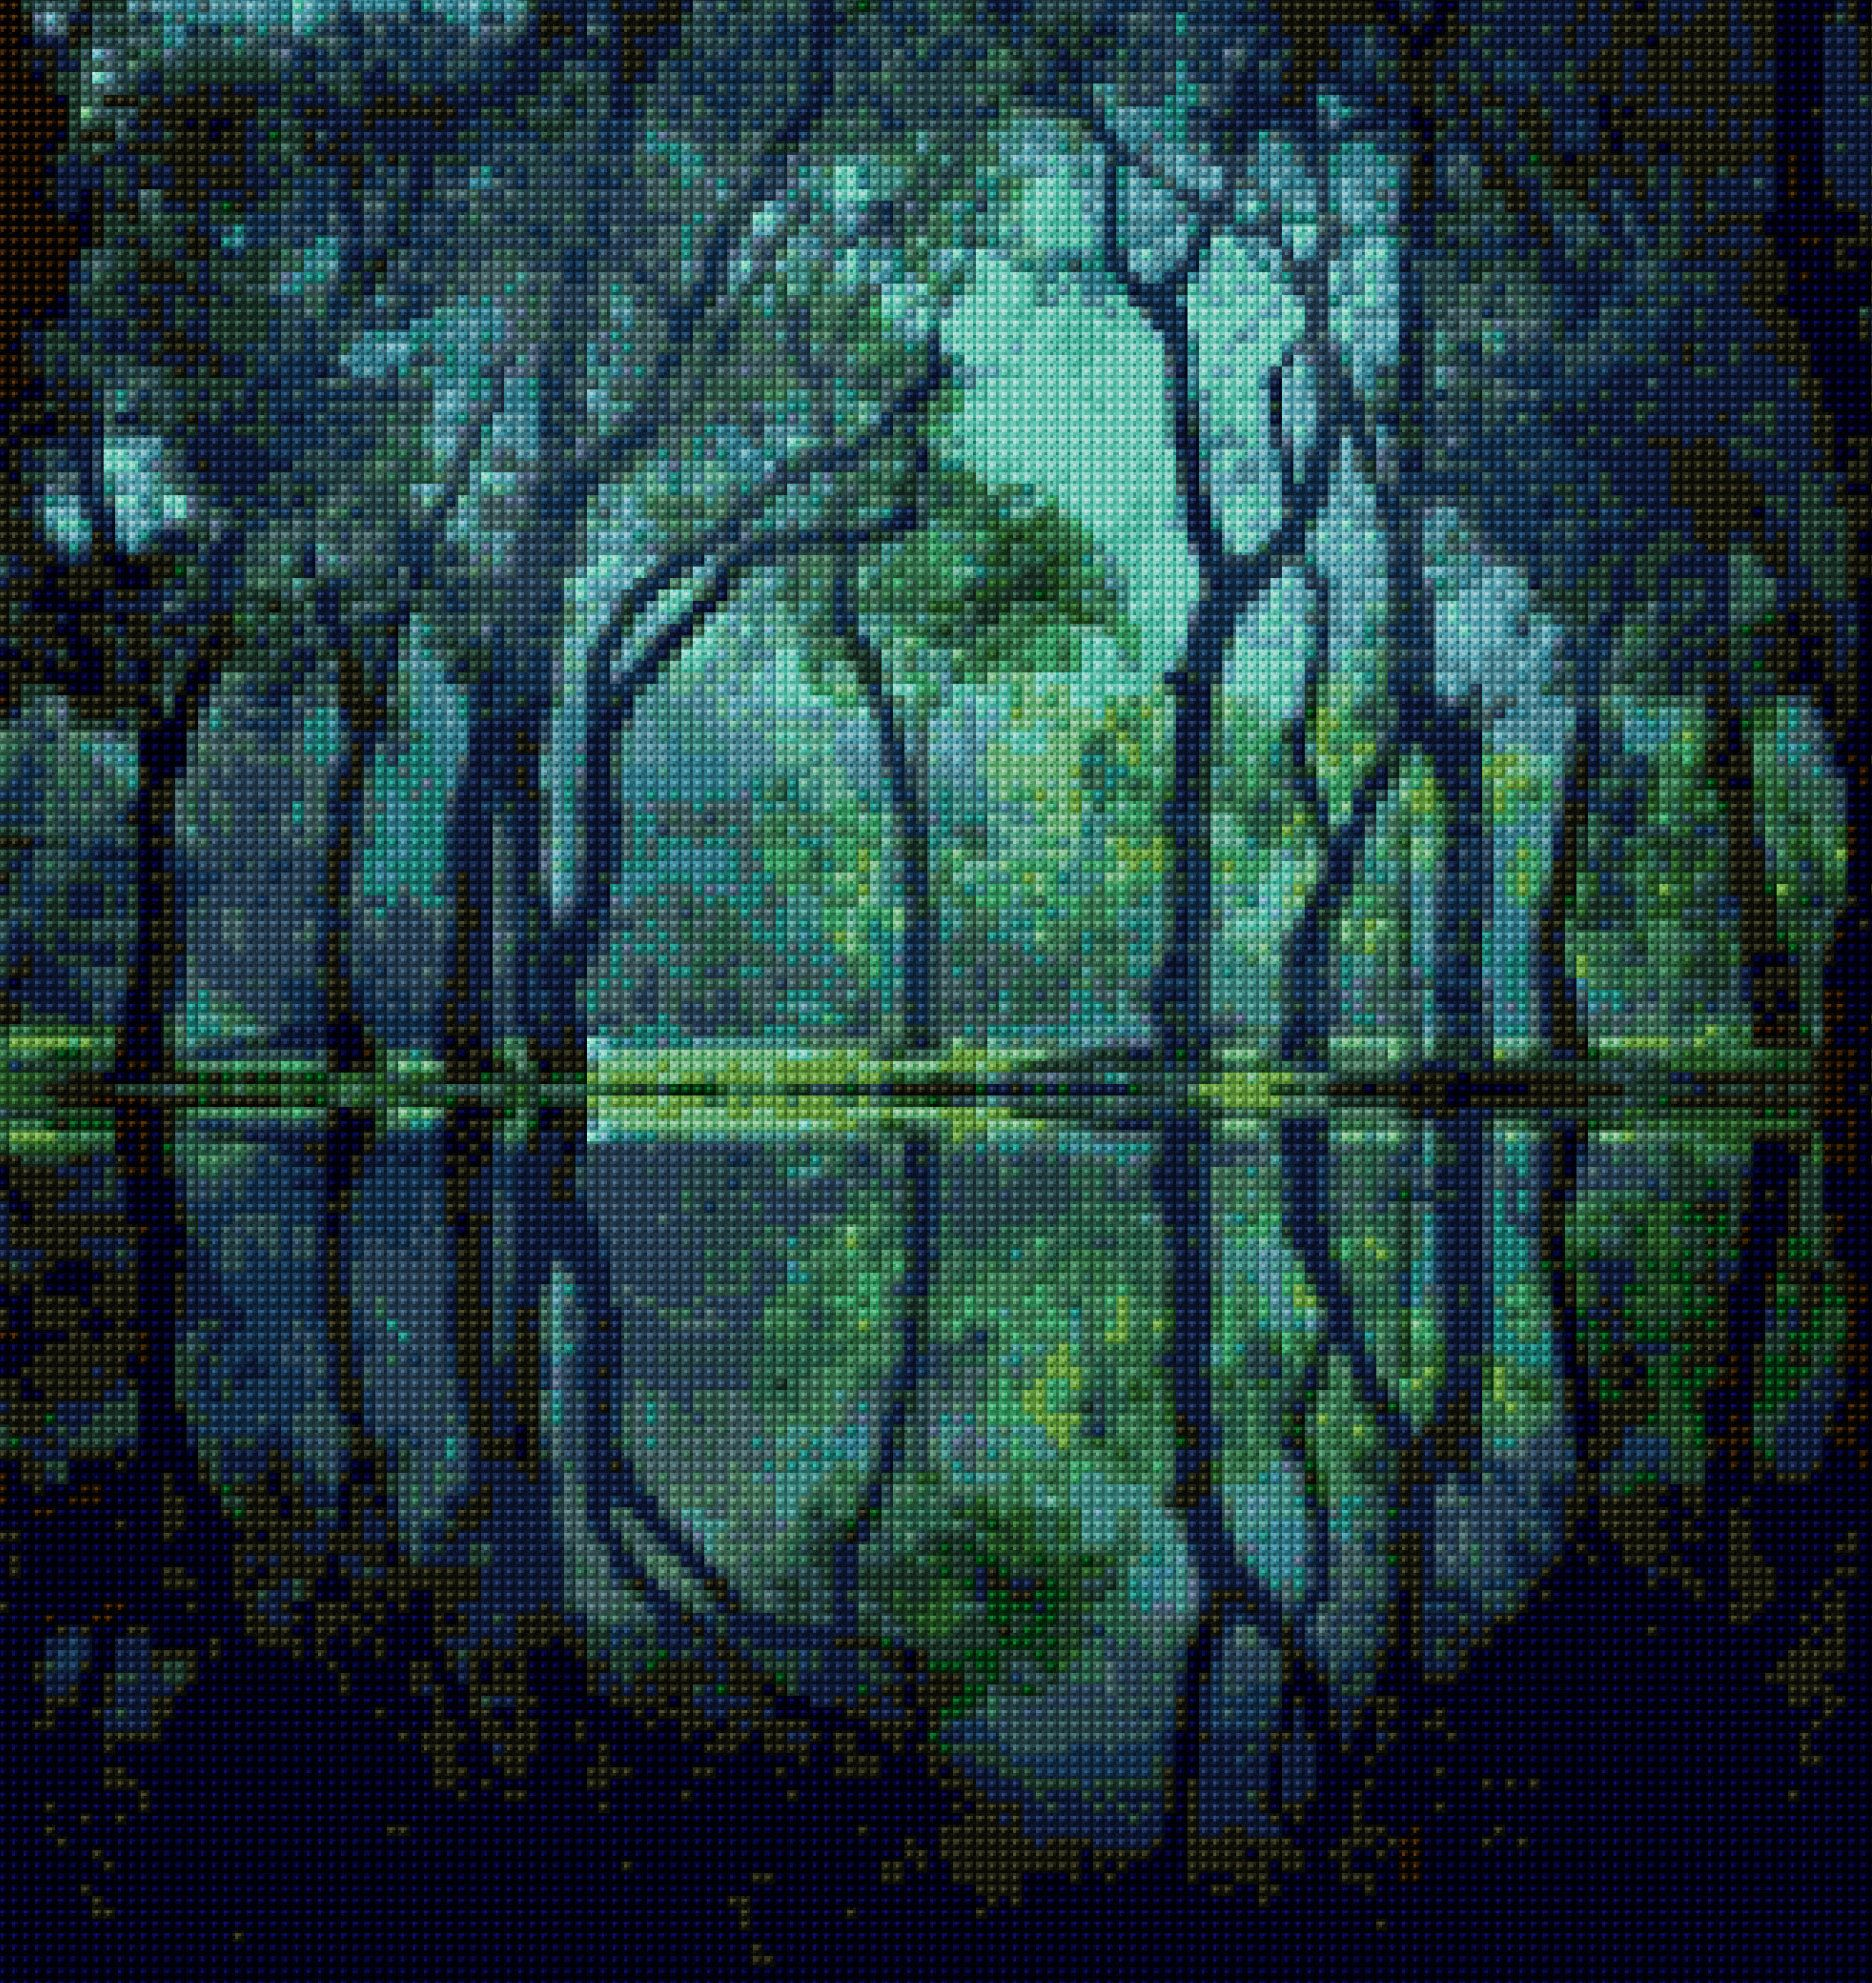 Mysterious Twilight Swamp landscape Cross stitch pattern